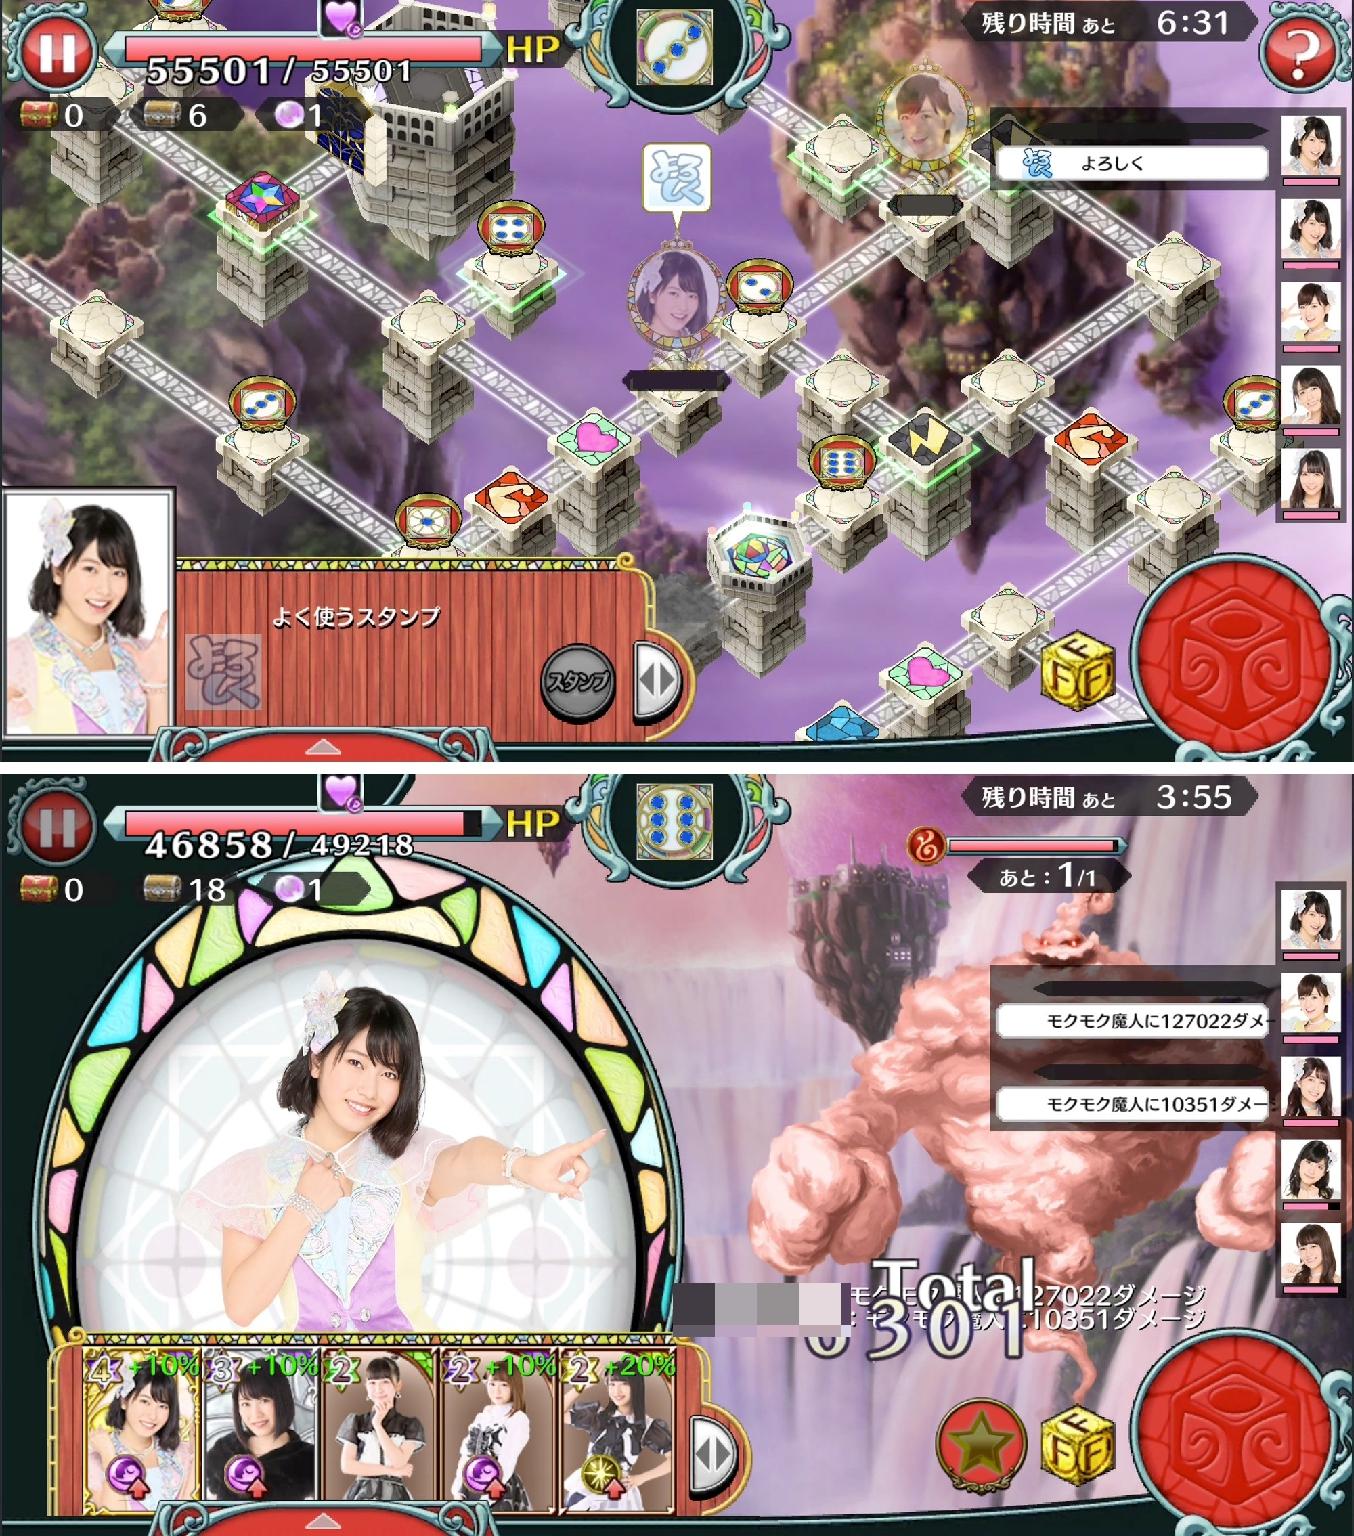 AKB48ダイスキャラバン【ゲームレビュー】